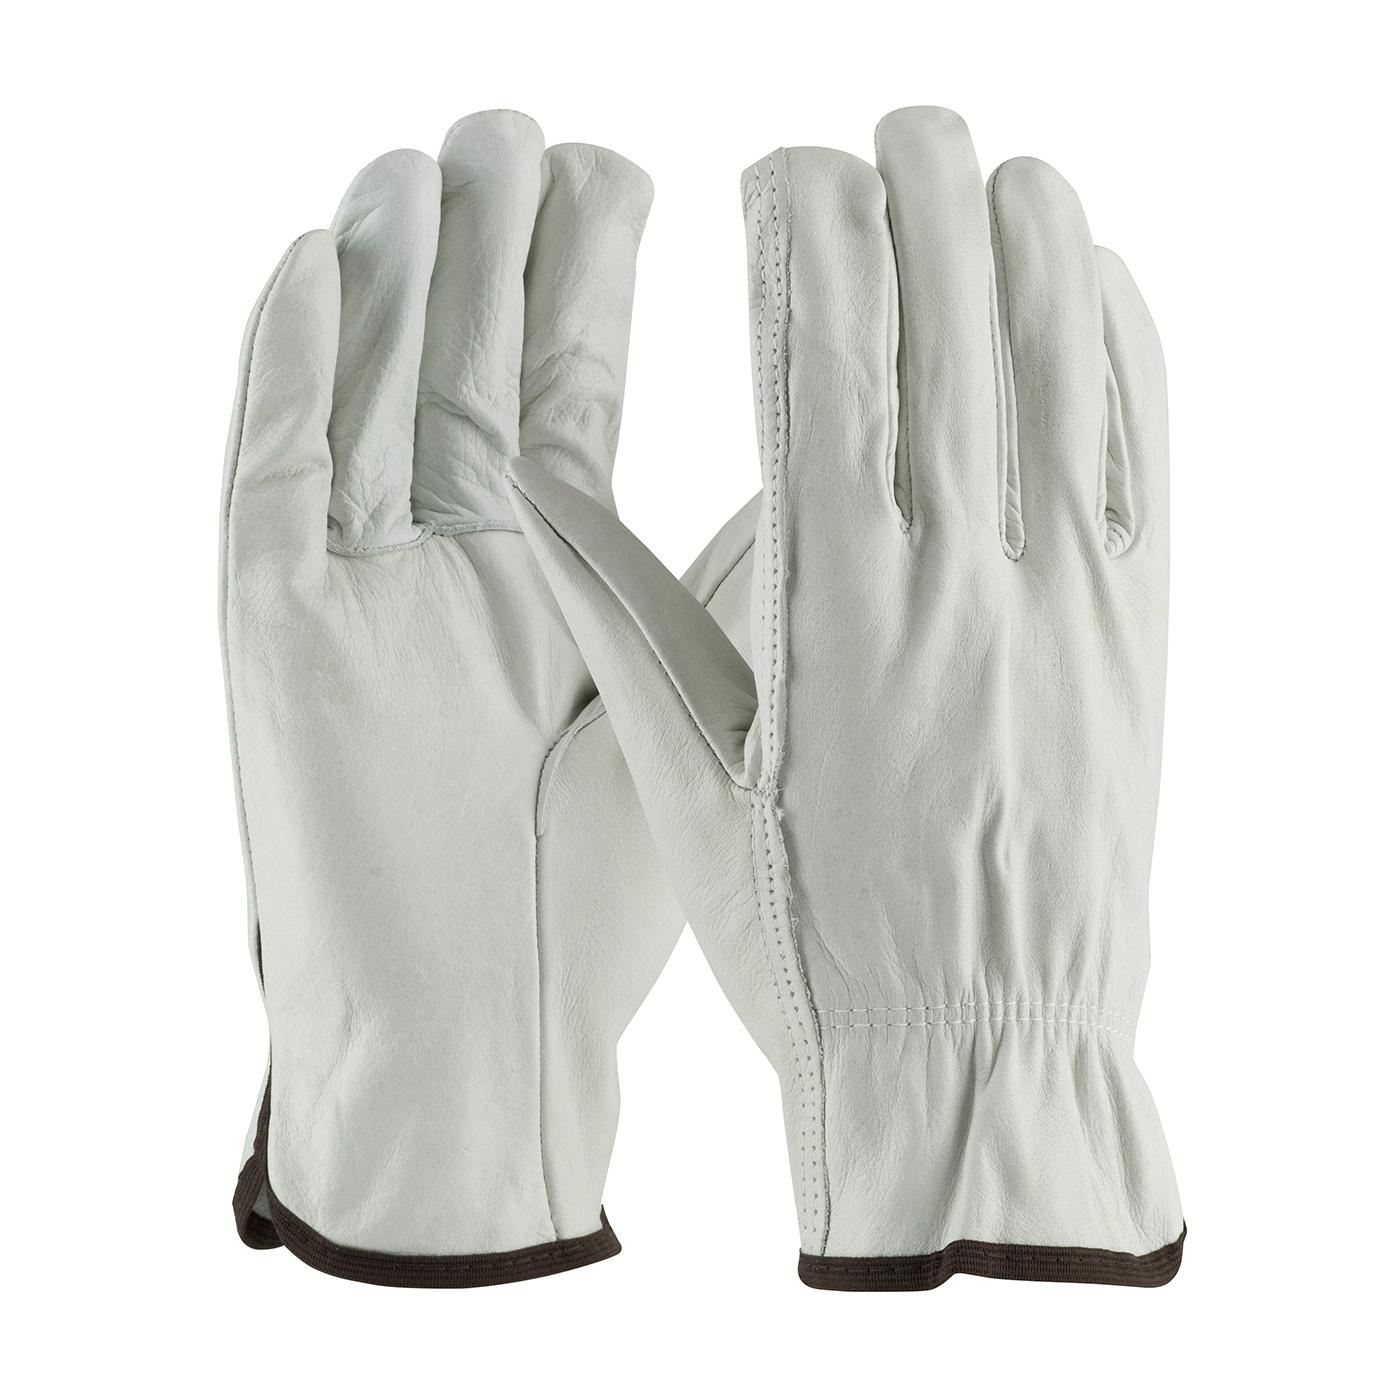 Regular Grade Top Grain Cowhide Leather Drivers Glove - Straight Thumb, Natural, L